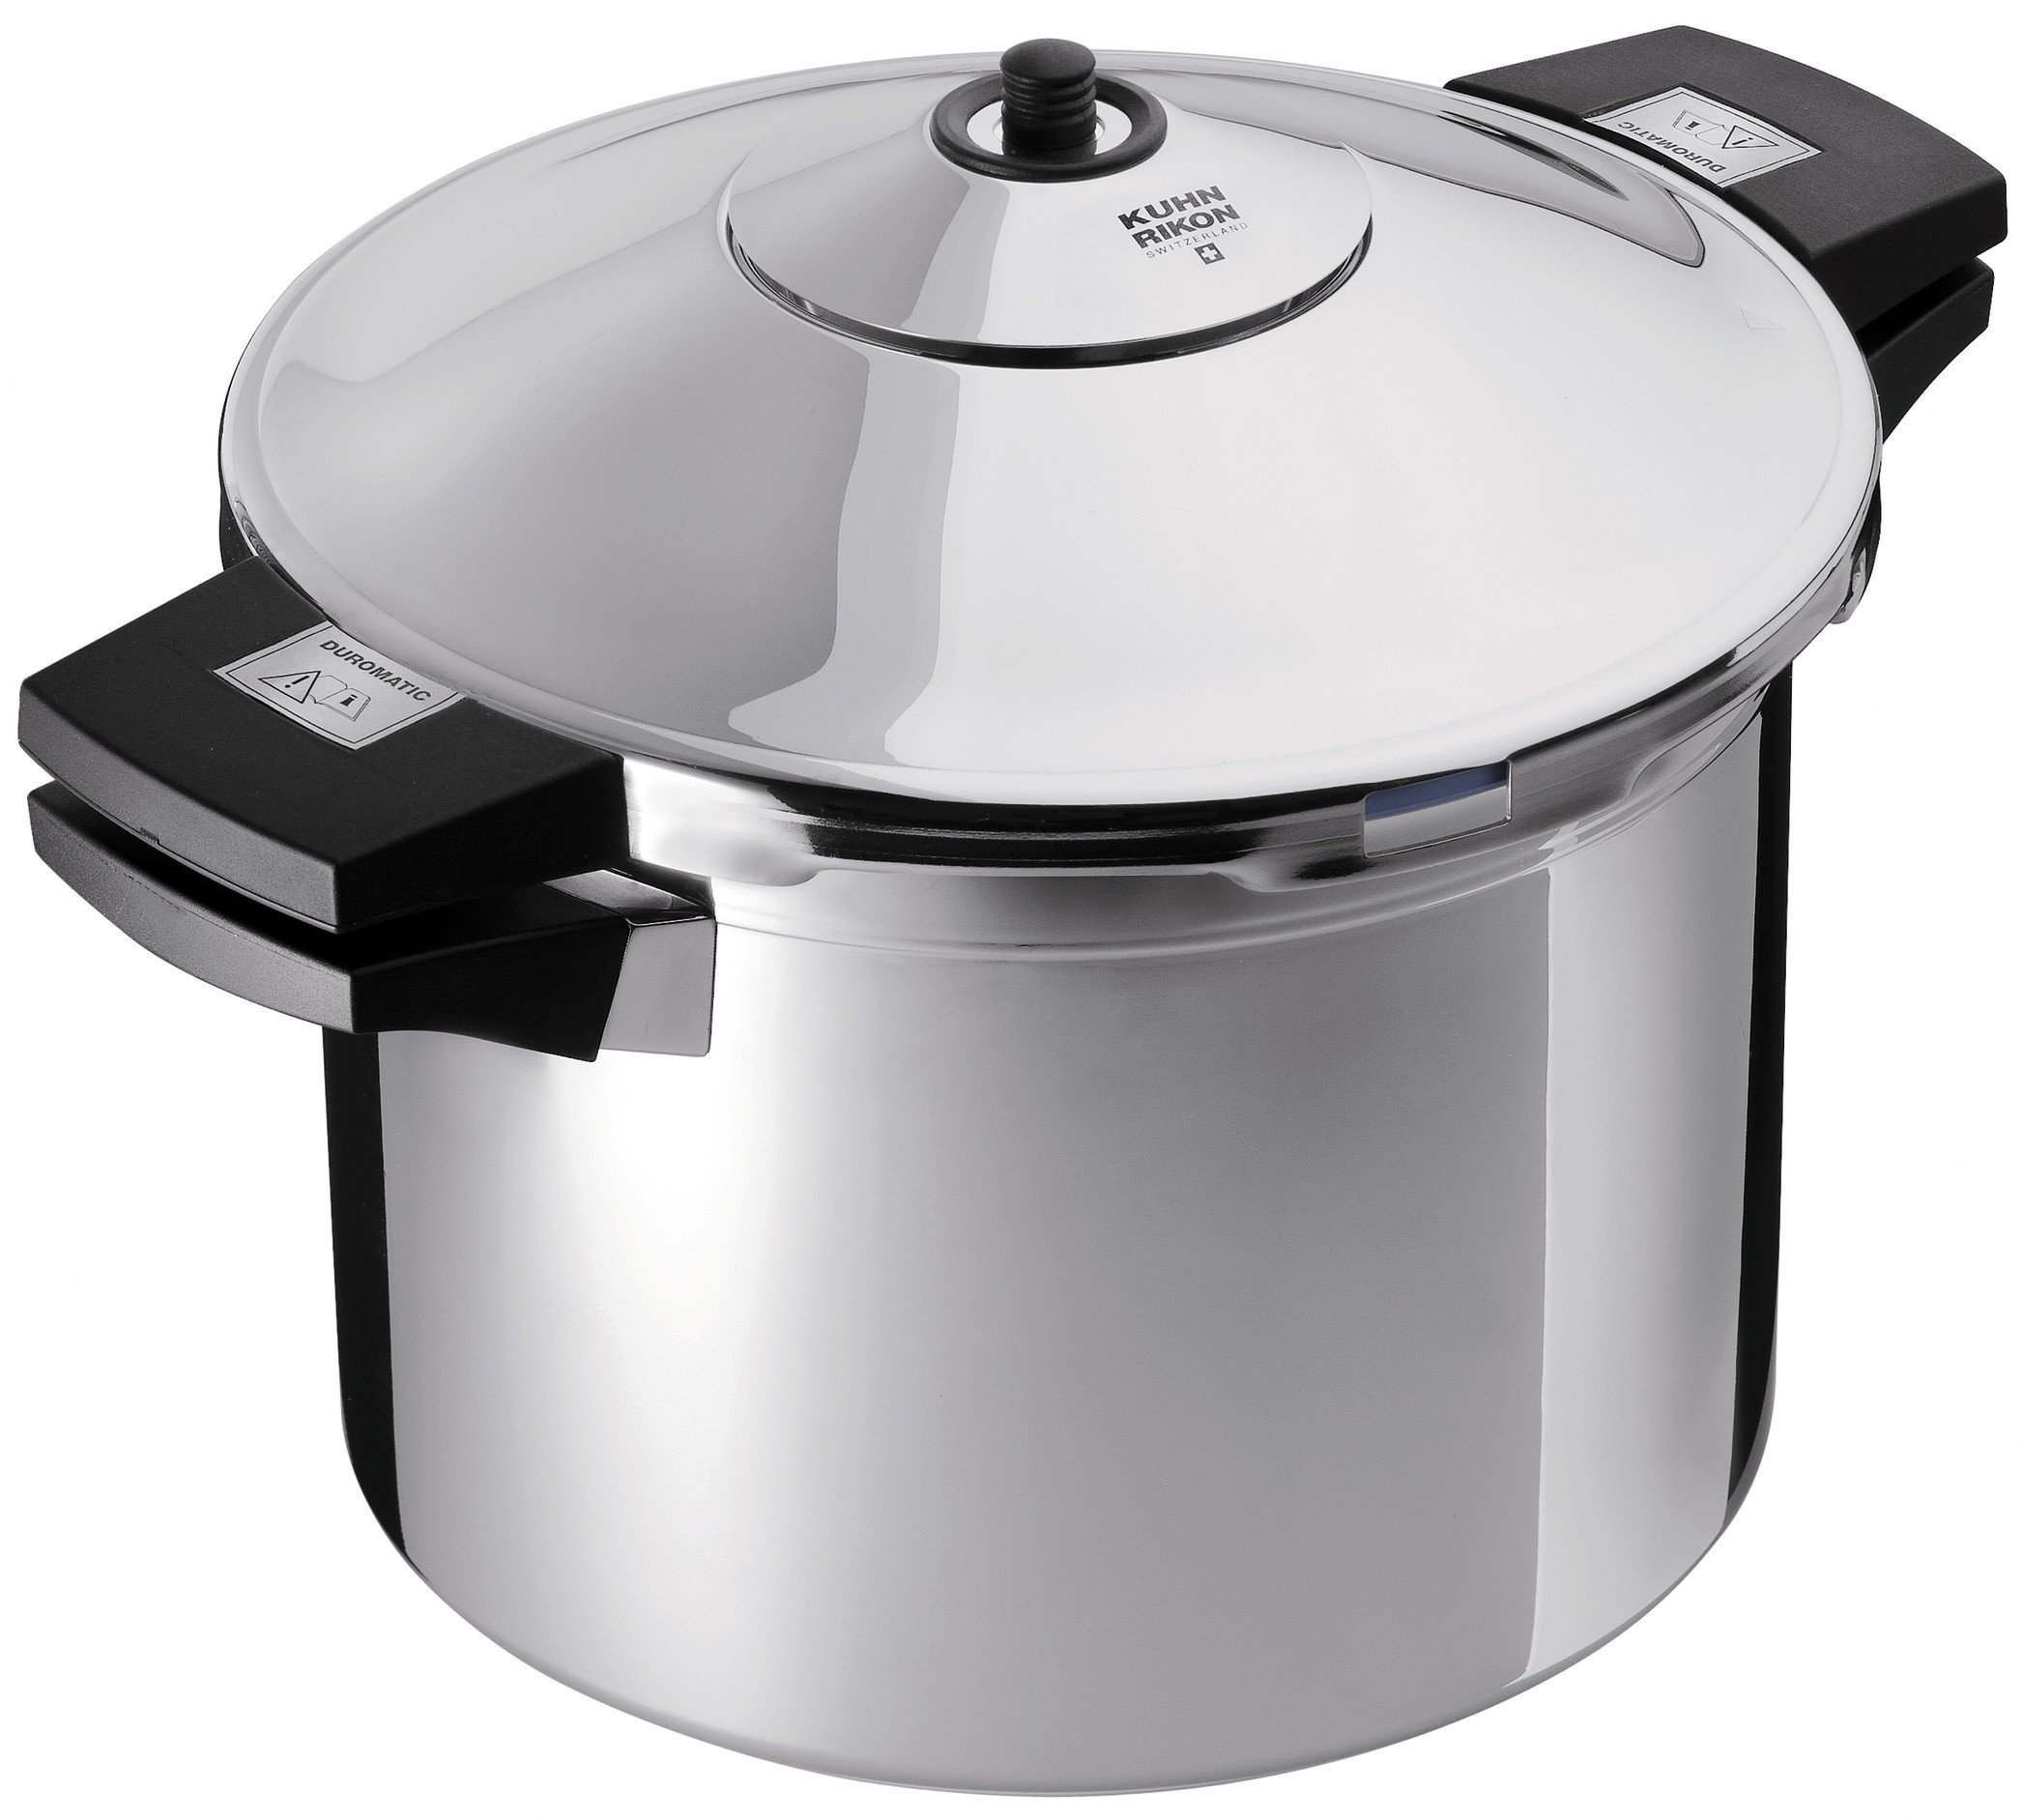 Kuhn Rikon Stainless-Steel Pressure Cooker, 8 qt